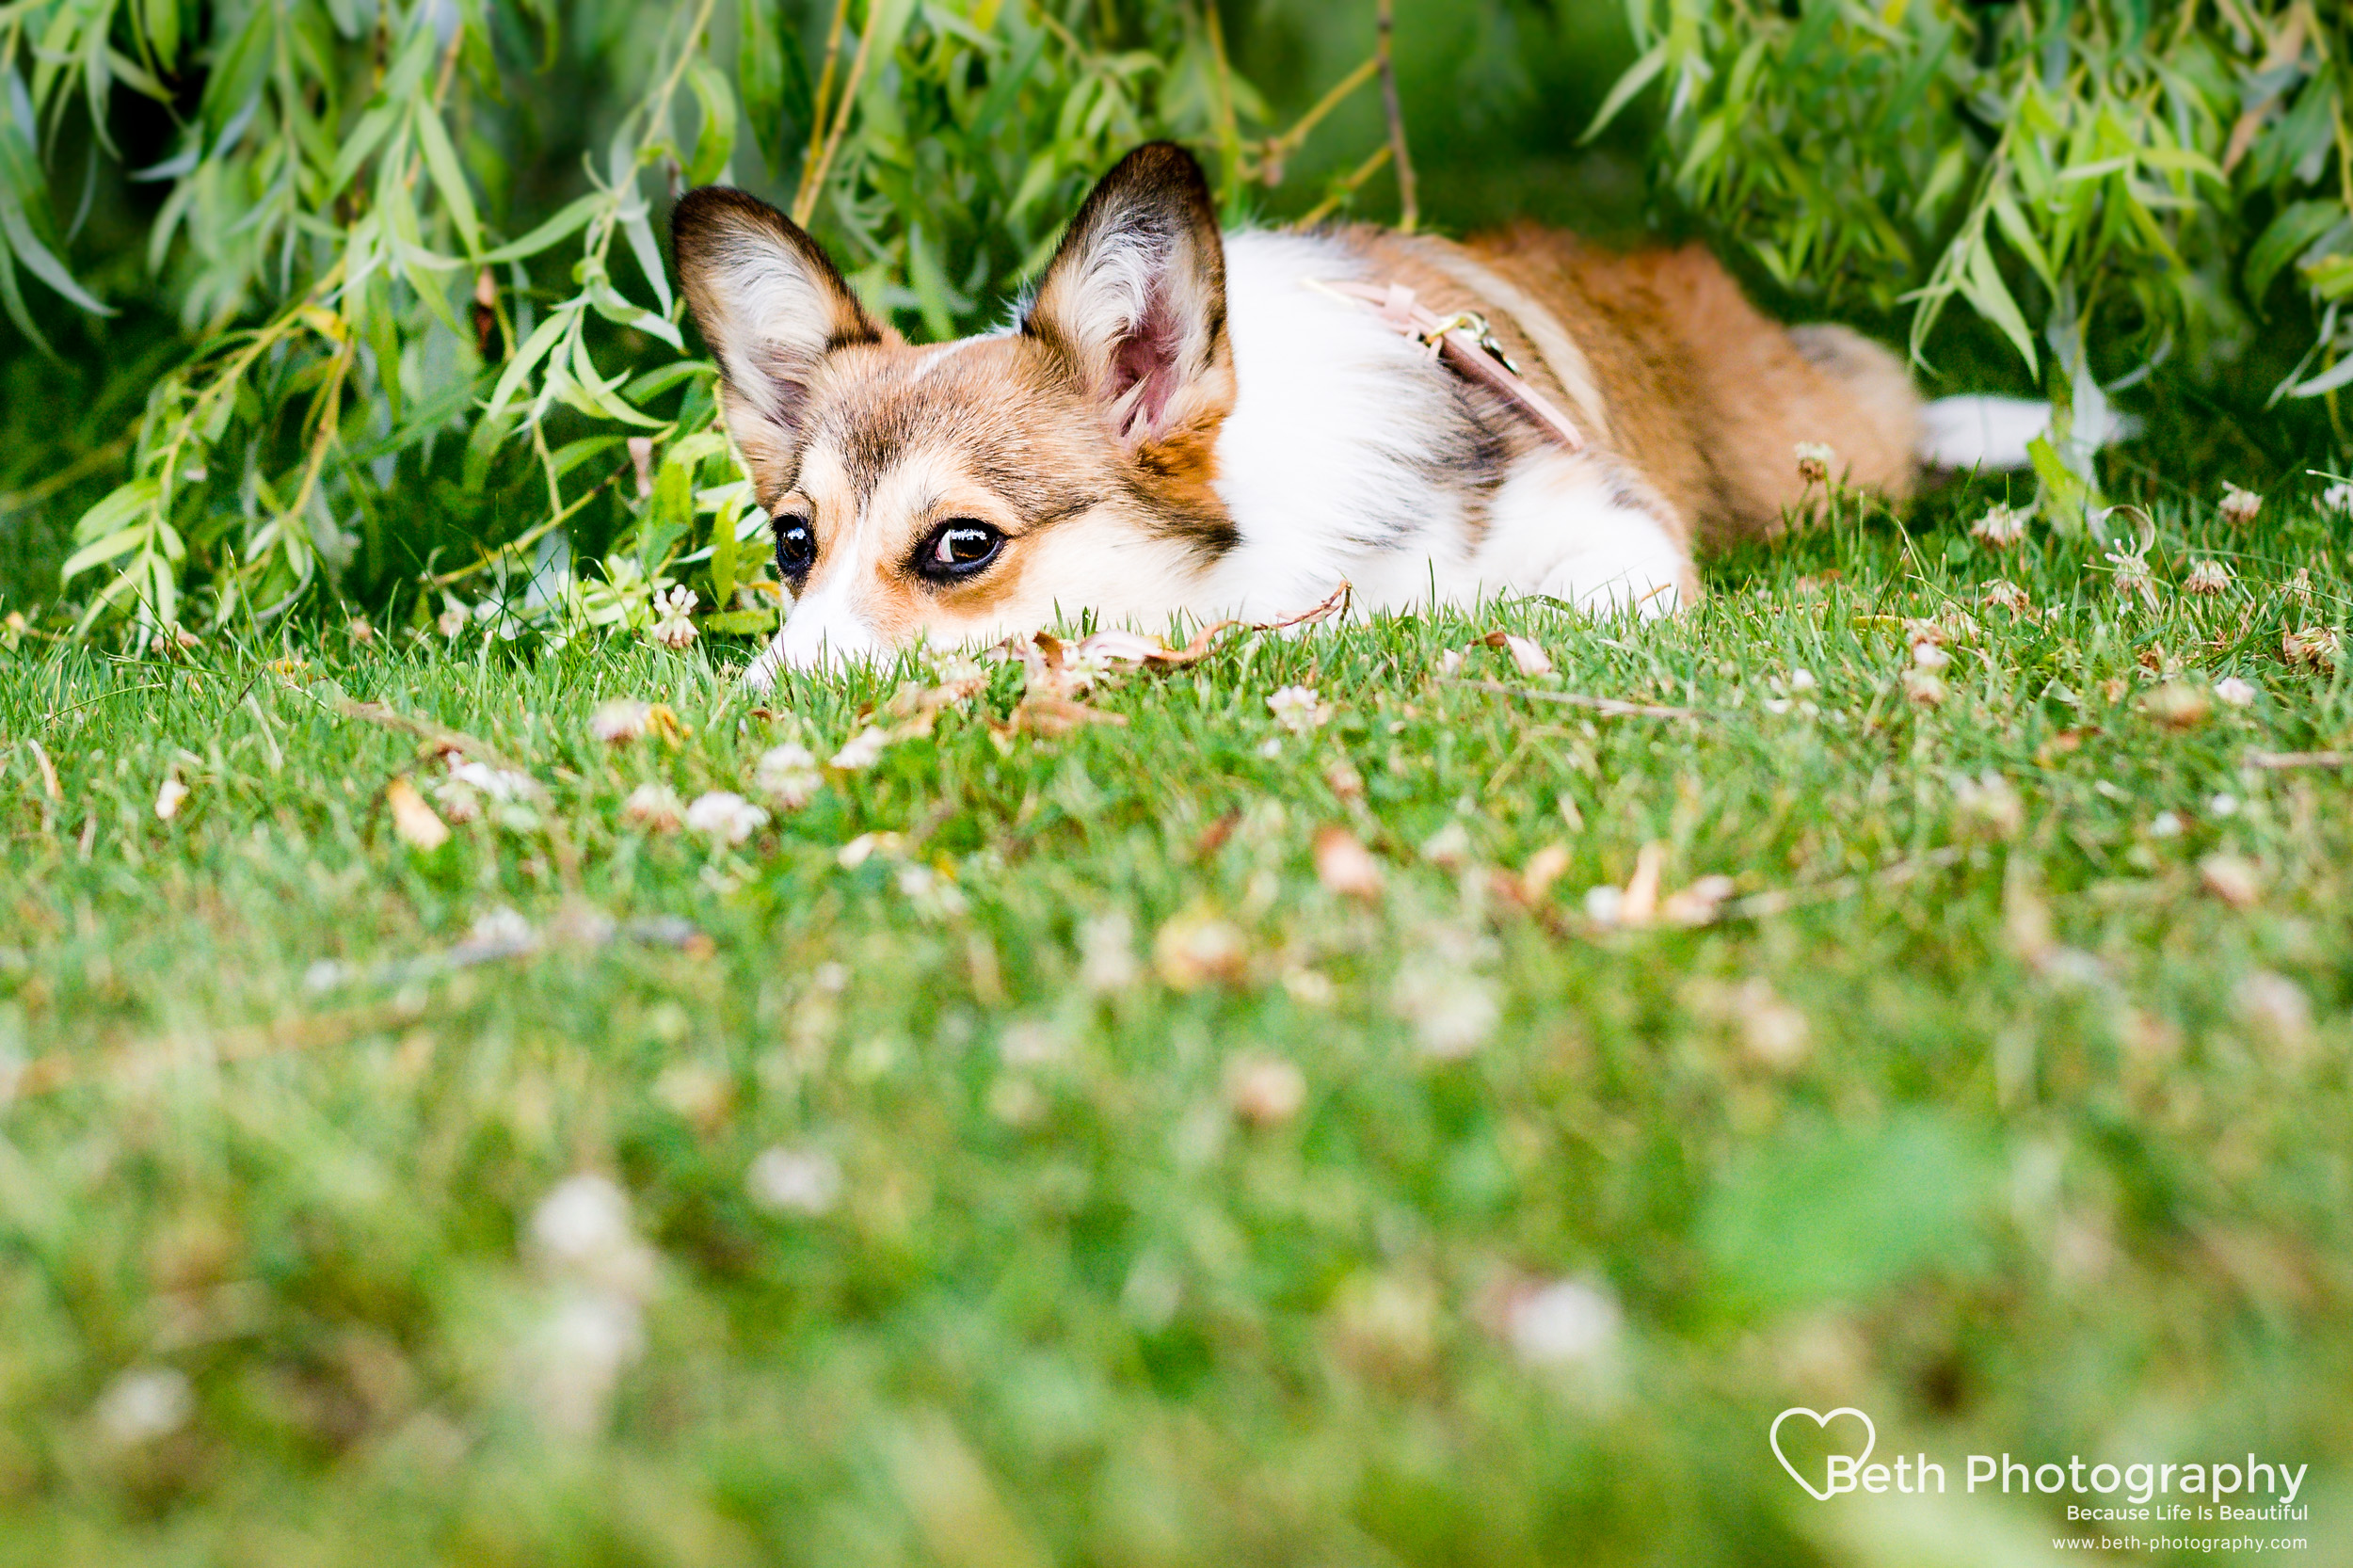 Beth Photography - Pet Photographer -Servicing Ottawa to Cornwall-21.jpg